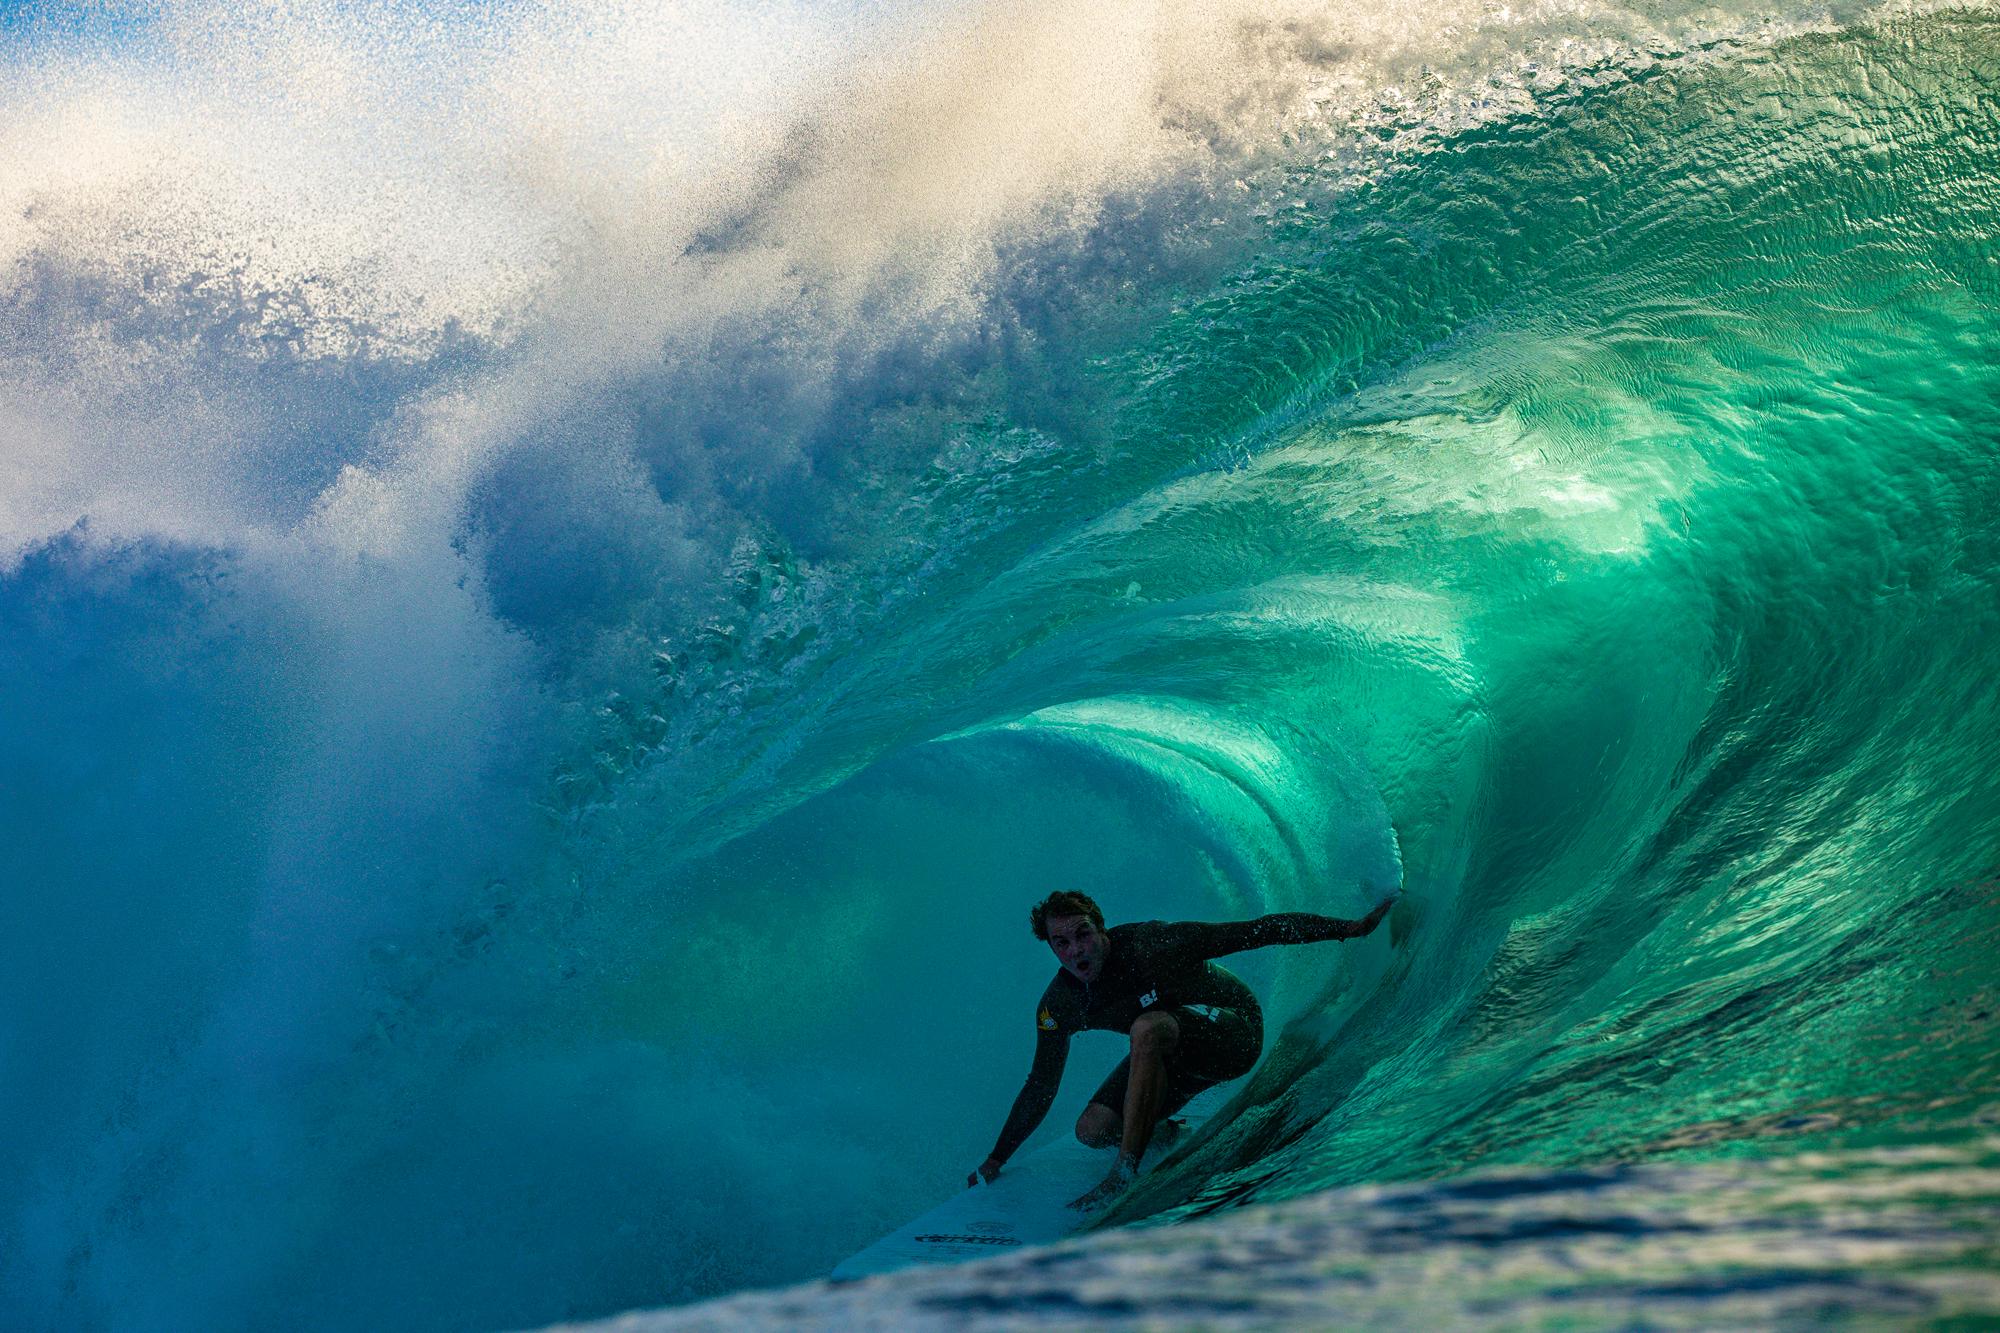 e20e504eab Jamie O'Brien at XL Pipeline on an XL Catch Surf Odysea soft-top. Photo:  Will Weaver